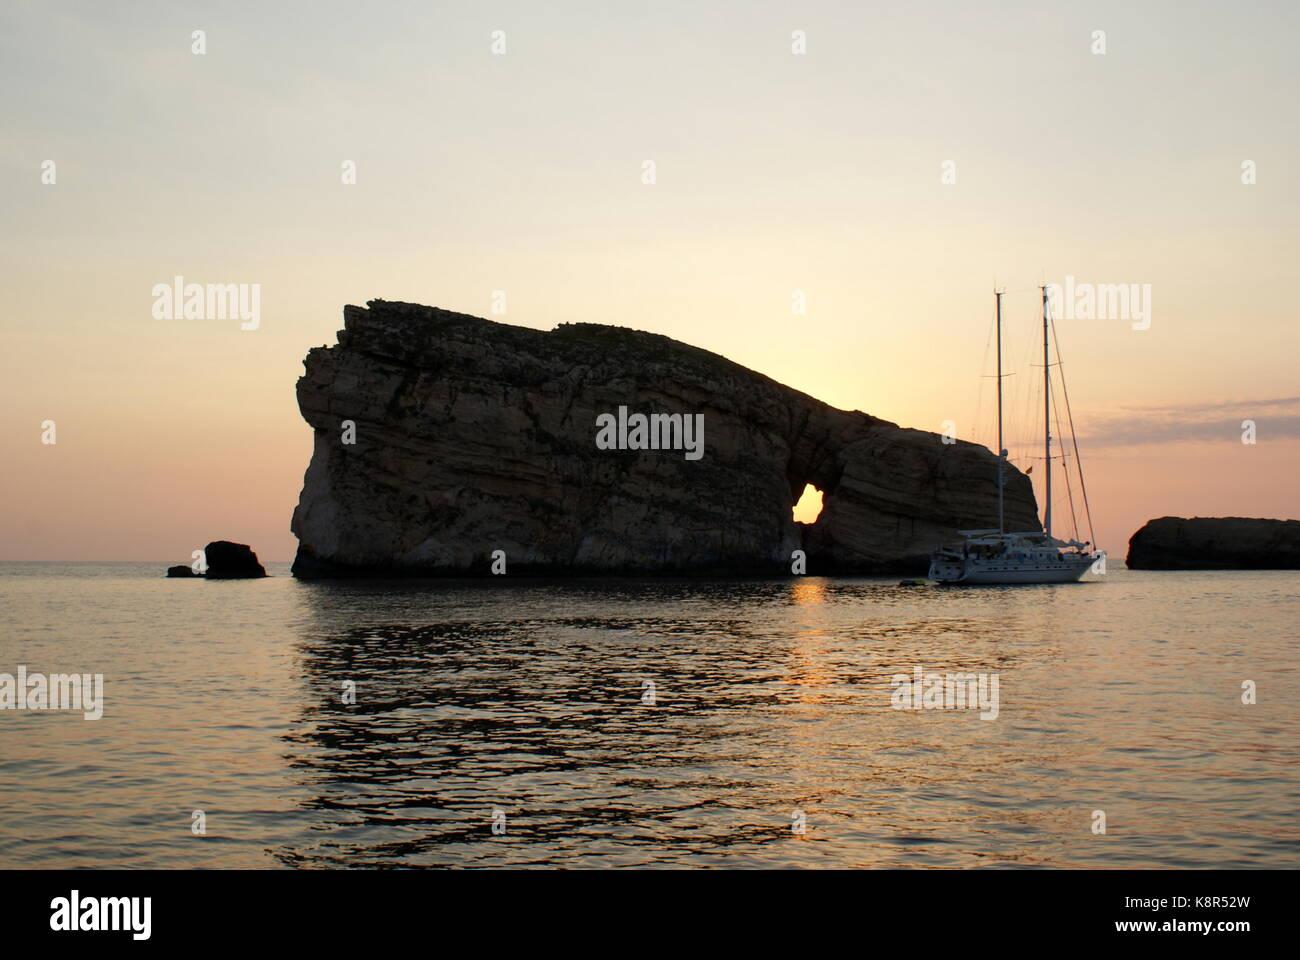 Sun setting behind Fungus rock, Dwejra bay, San Lawrenz, Gozo, Maltese archipelago - Stock Image